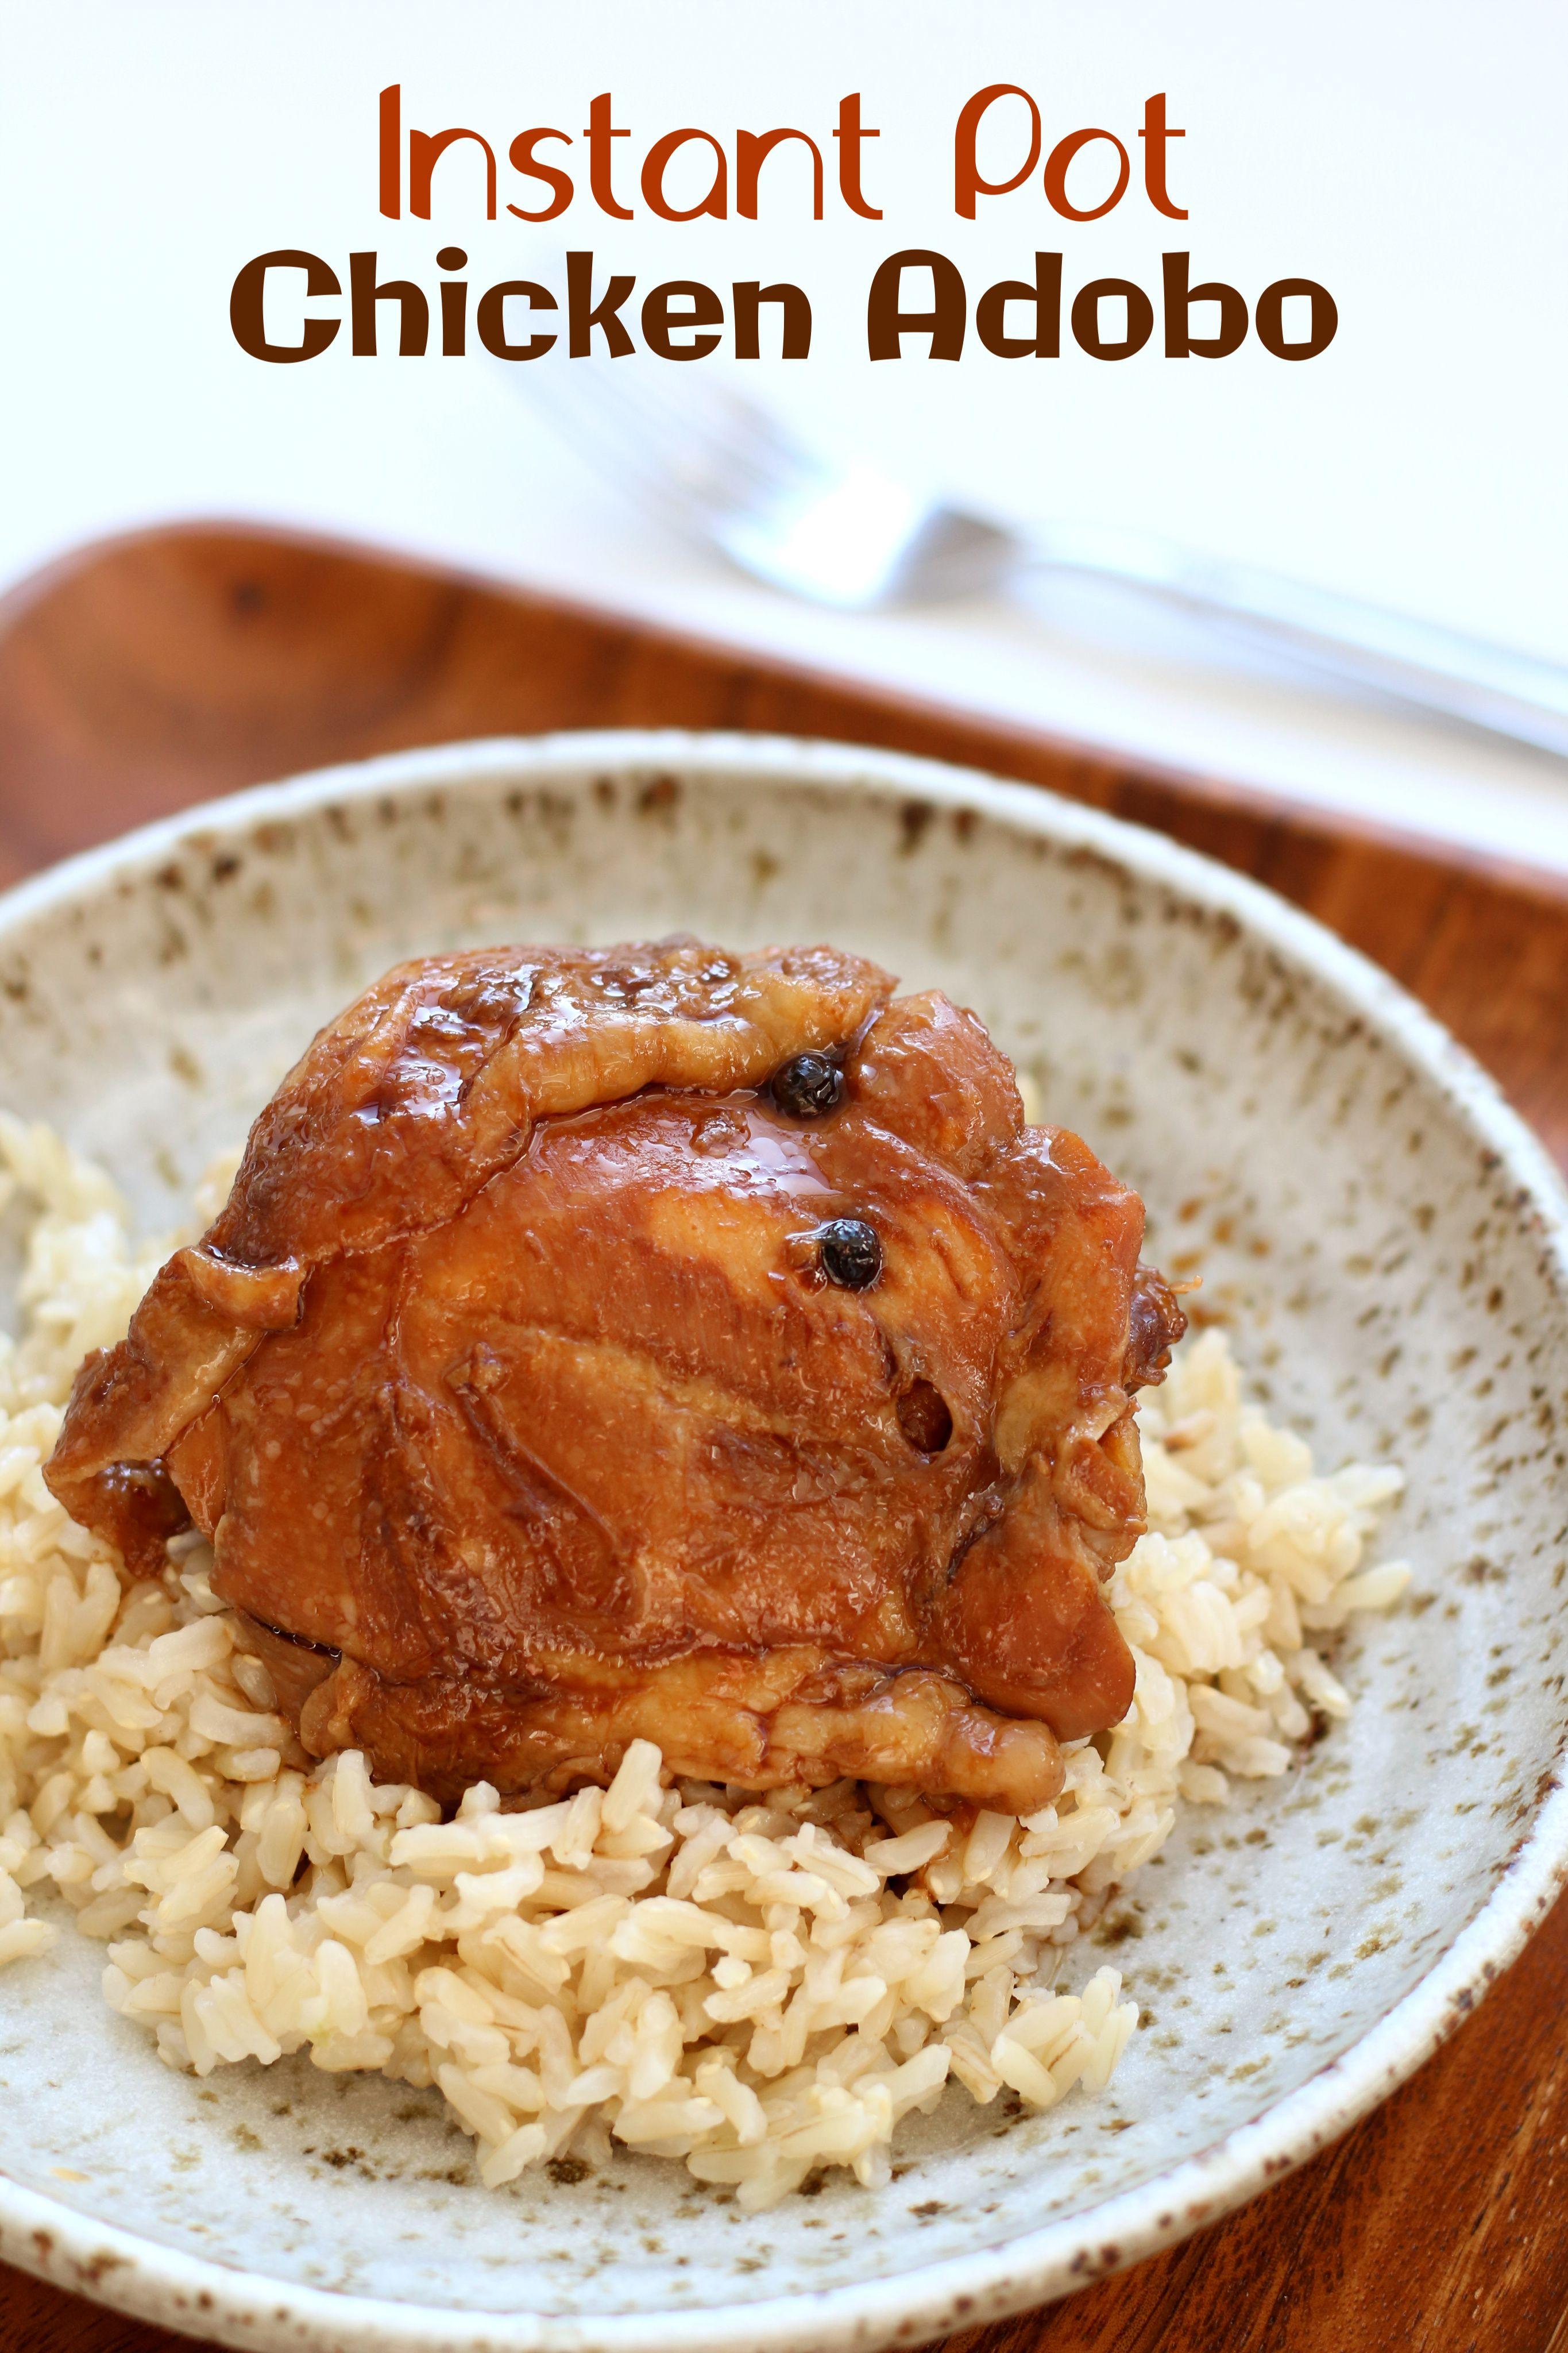 Instant Pot Chicken Adobo Recipe Instant Pot Dinner Recipes Food Recipes Cooking